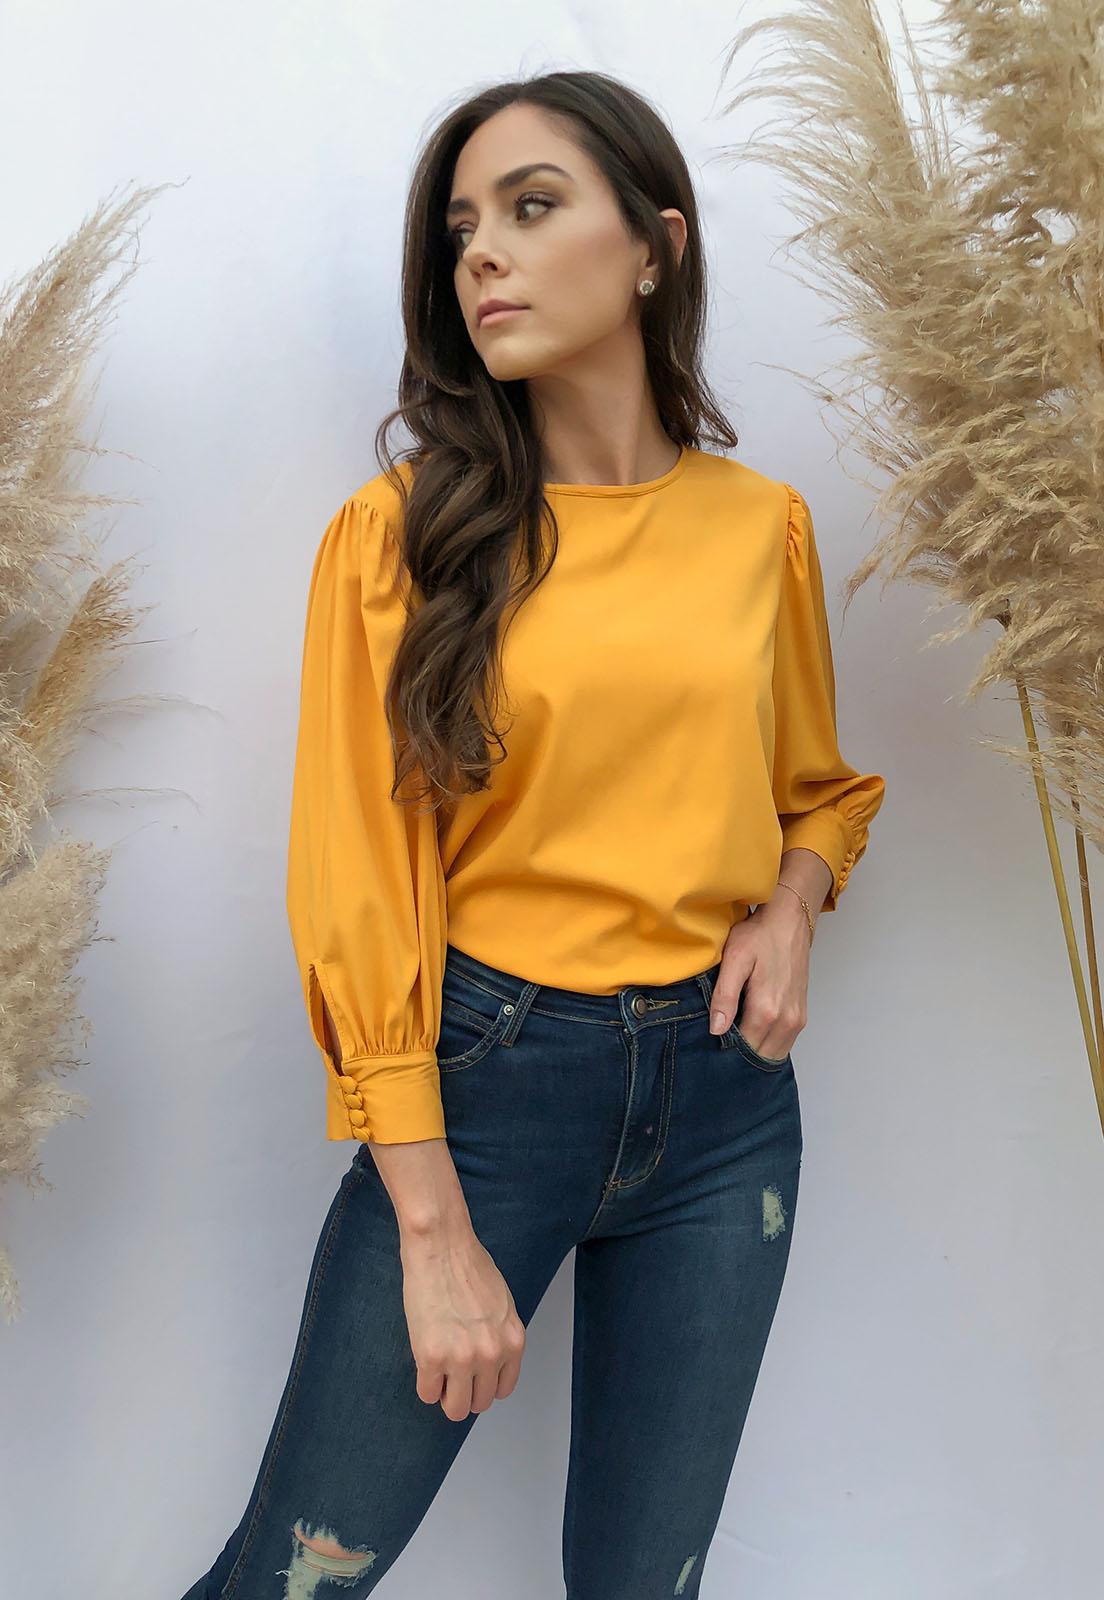 Blusa Viscose Mangas Fofas 3/4 Amarelo Mostarda